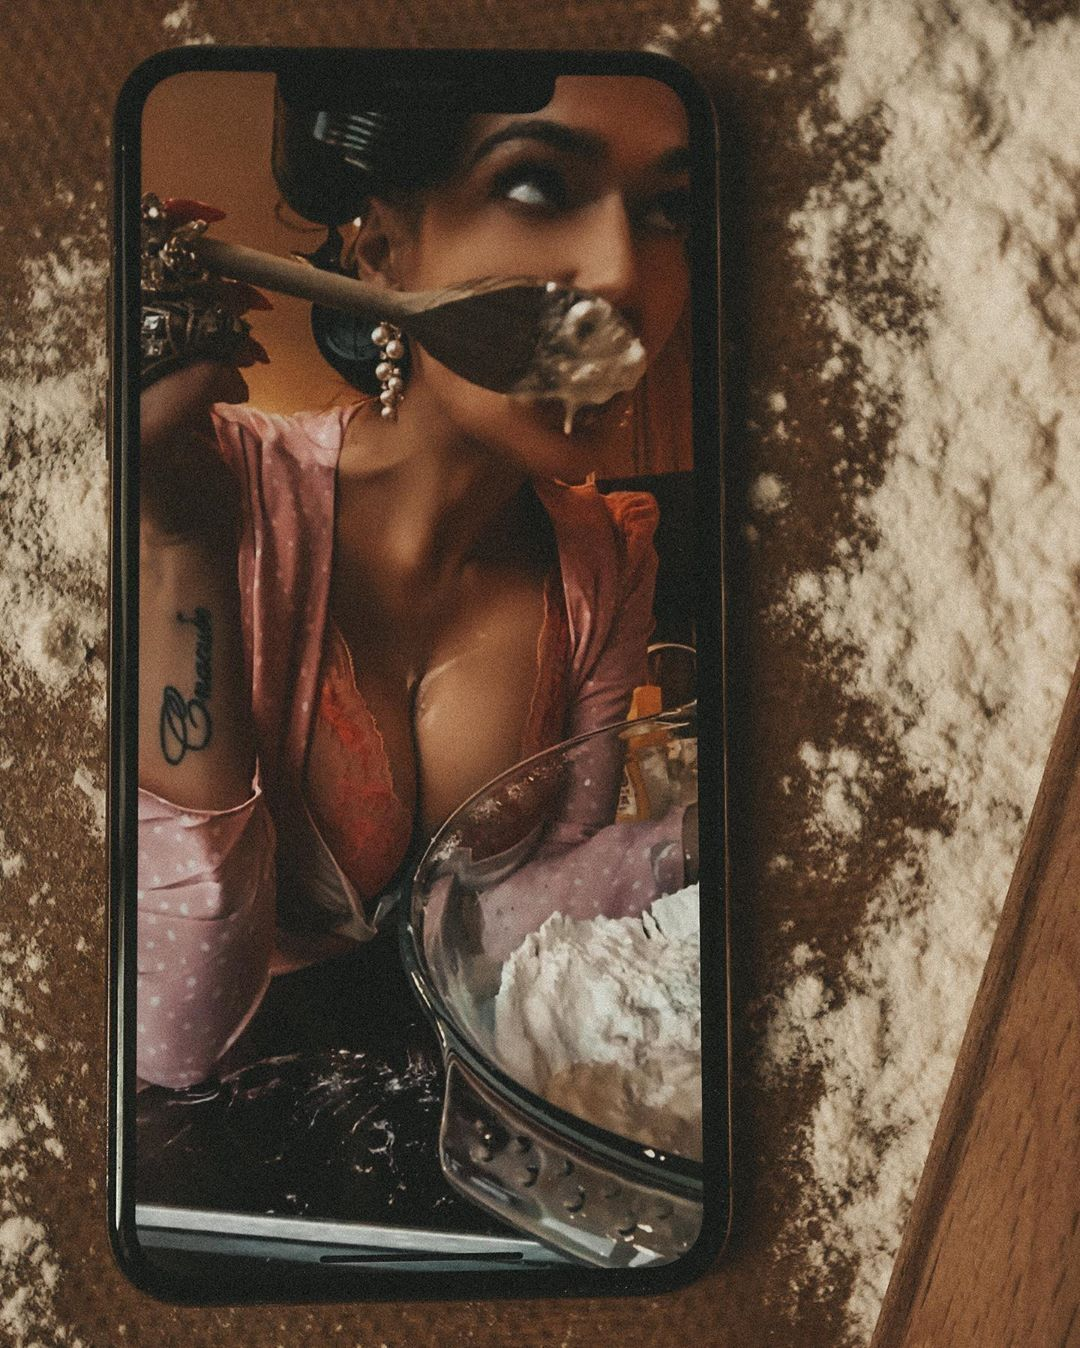 Алена Водонаева сексуально позирует на камеру